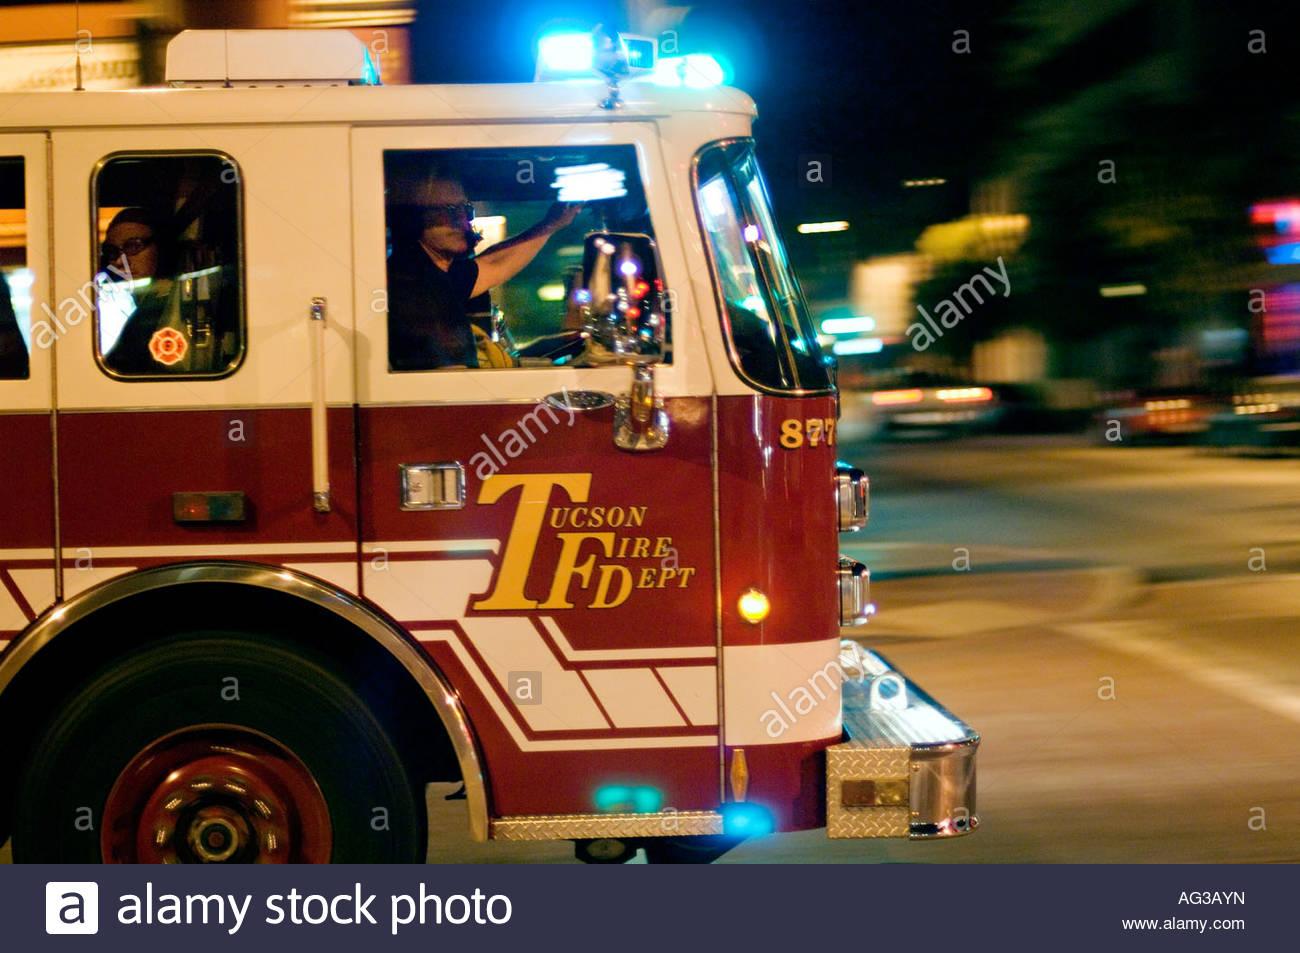 Fire truck responding to an emergency call entering traffic stock fire truck responding to an emergency call entering traffic intersection in downtown tucson arizona at night freerunsca Choice Image